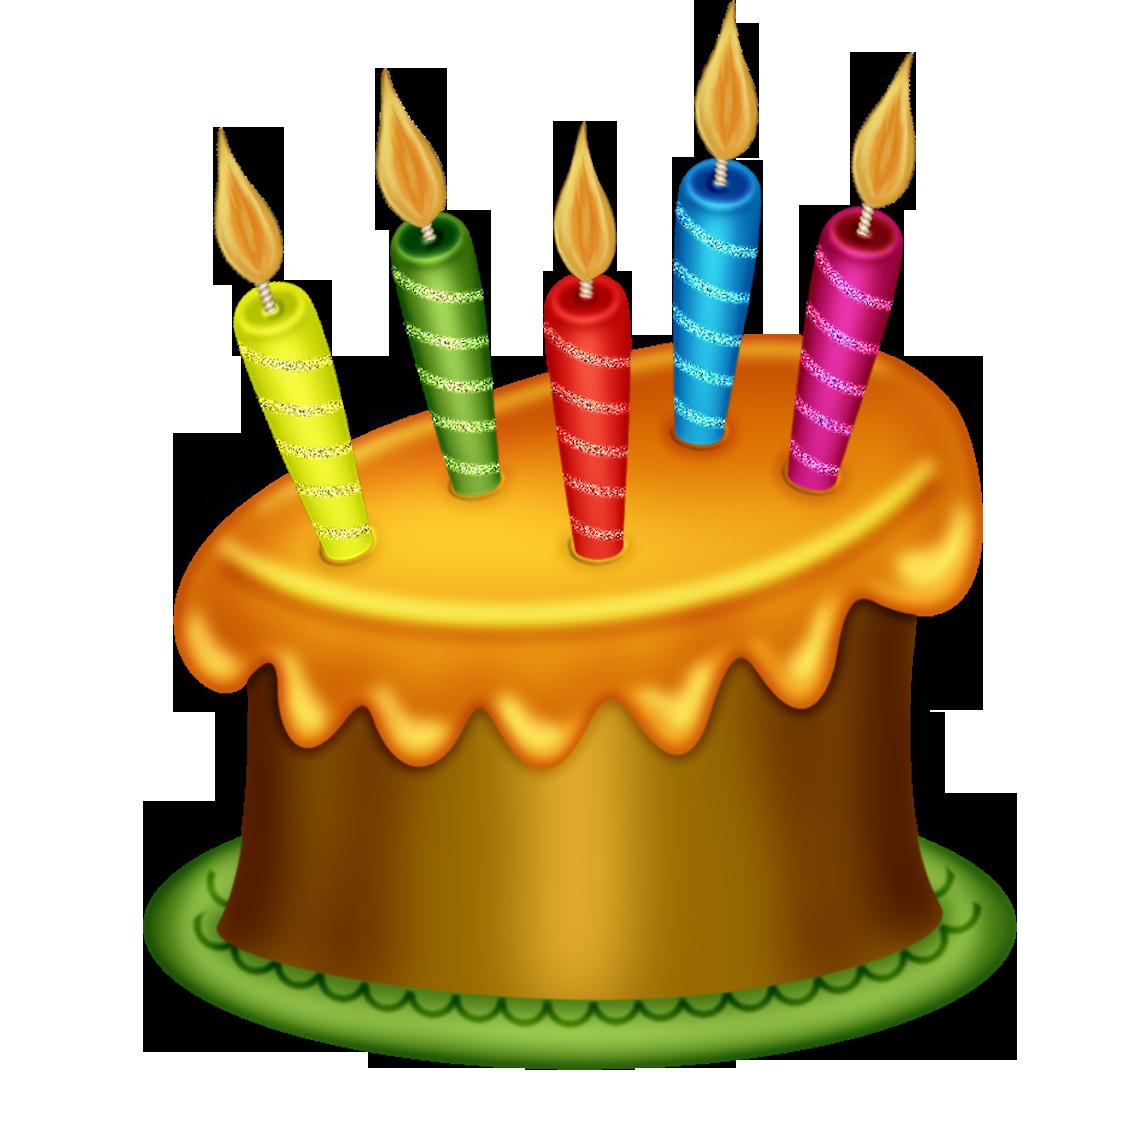 Cake birthday PNG - Birthday Cake PNG